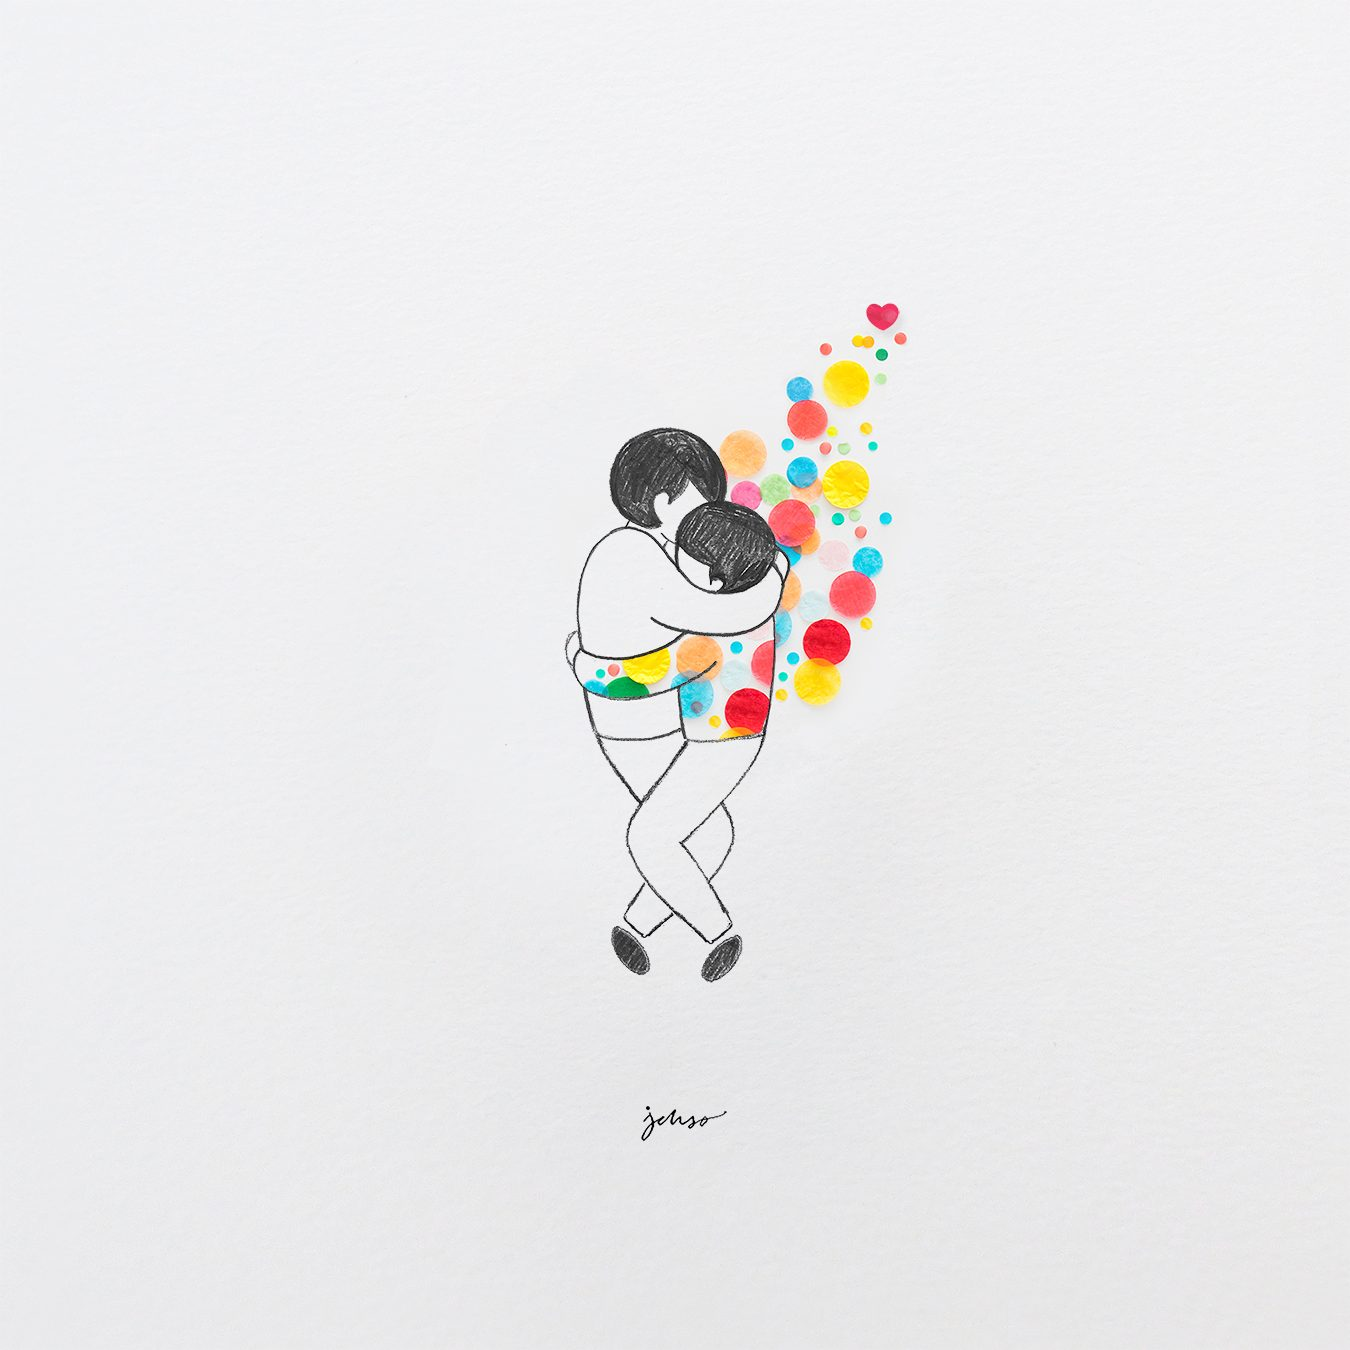 Jesus Ortiz-Valentine's Day concept